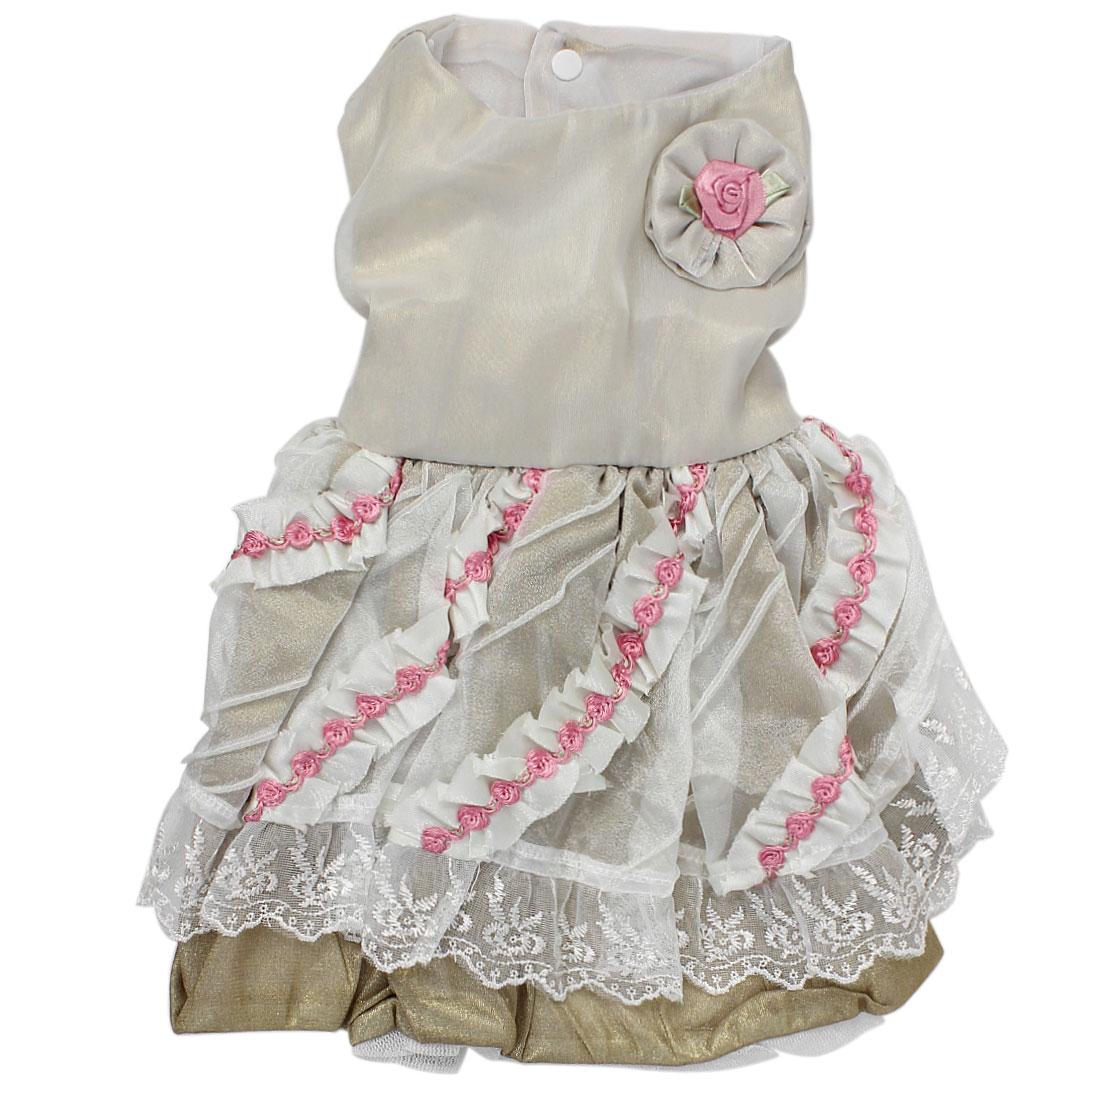 Pet Dog Puppy Rose Lace Decor Princess Wedding Dress Skirt Gold Tone Size S